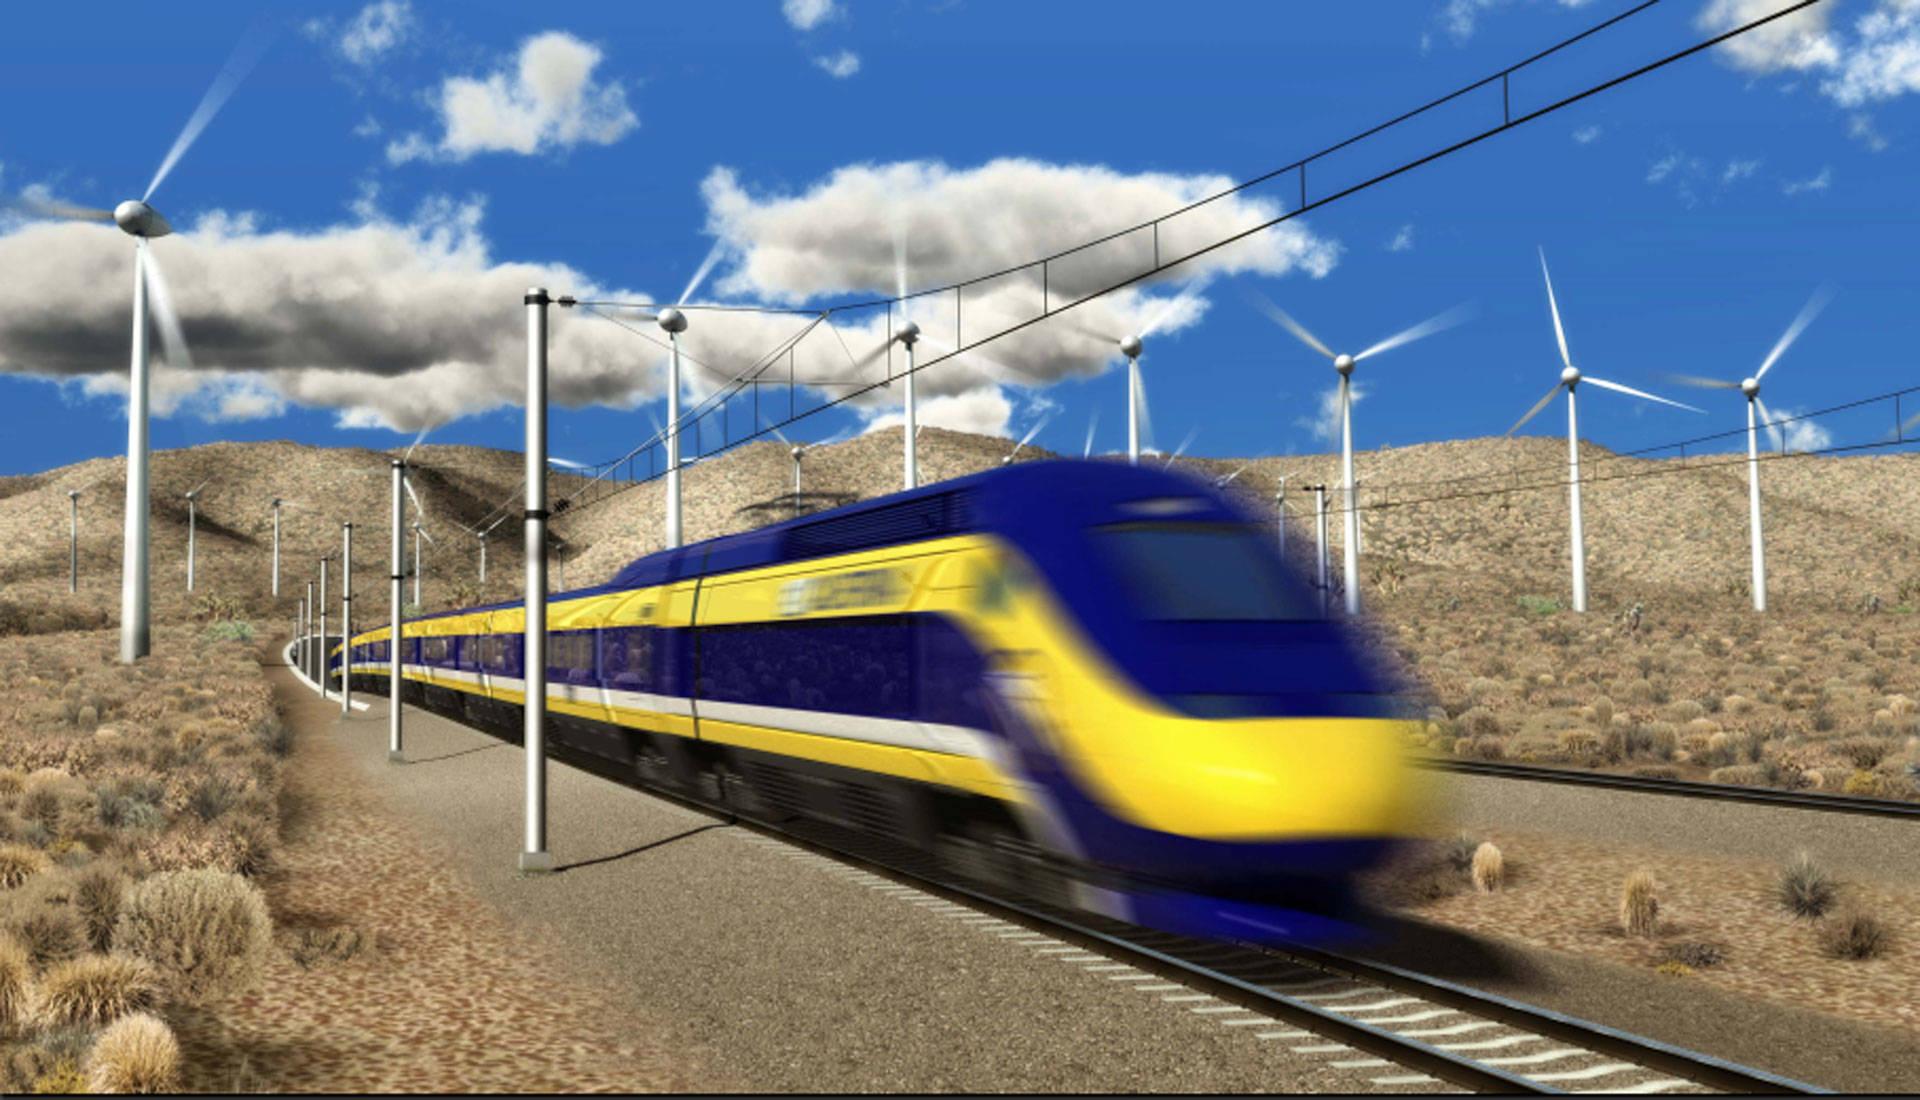 Rendering of high-speed rail train.